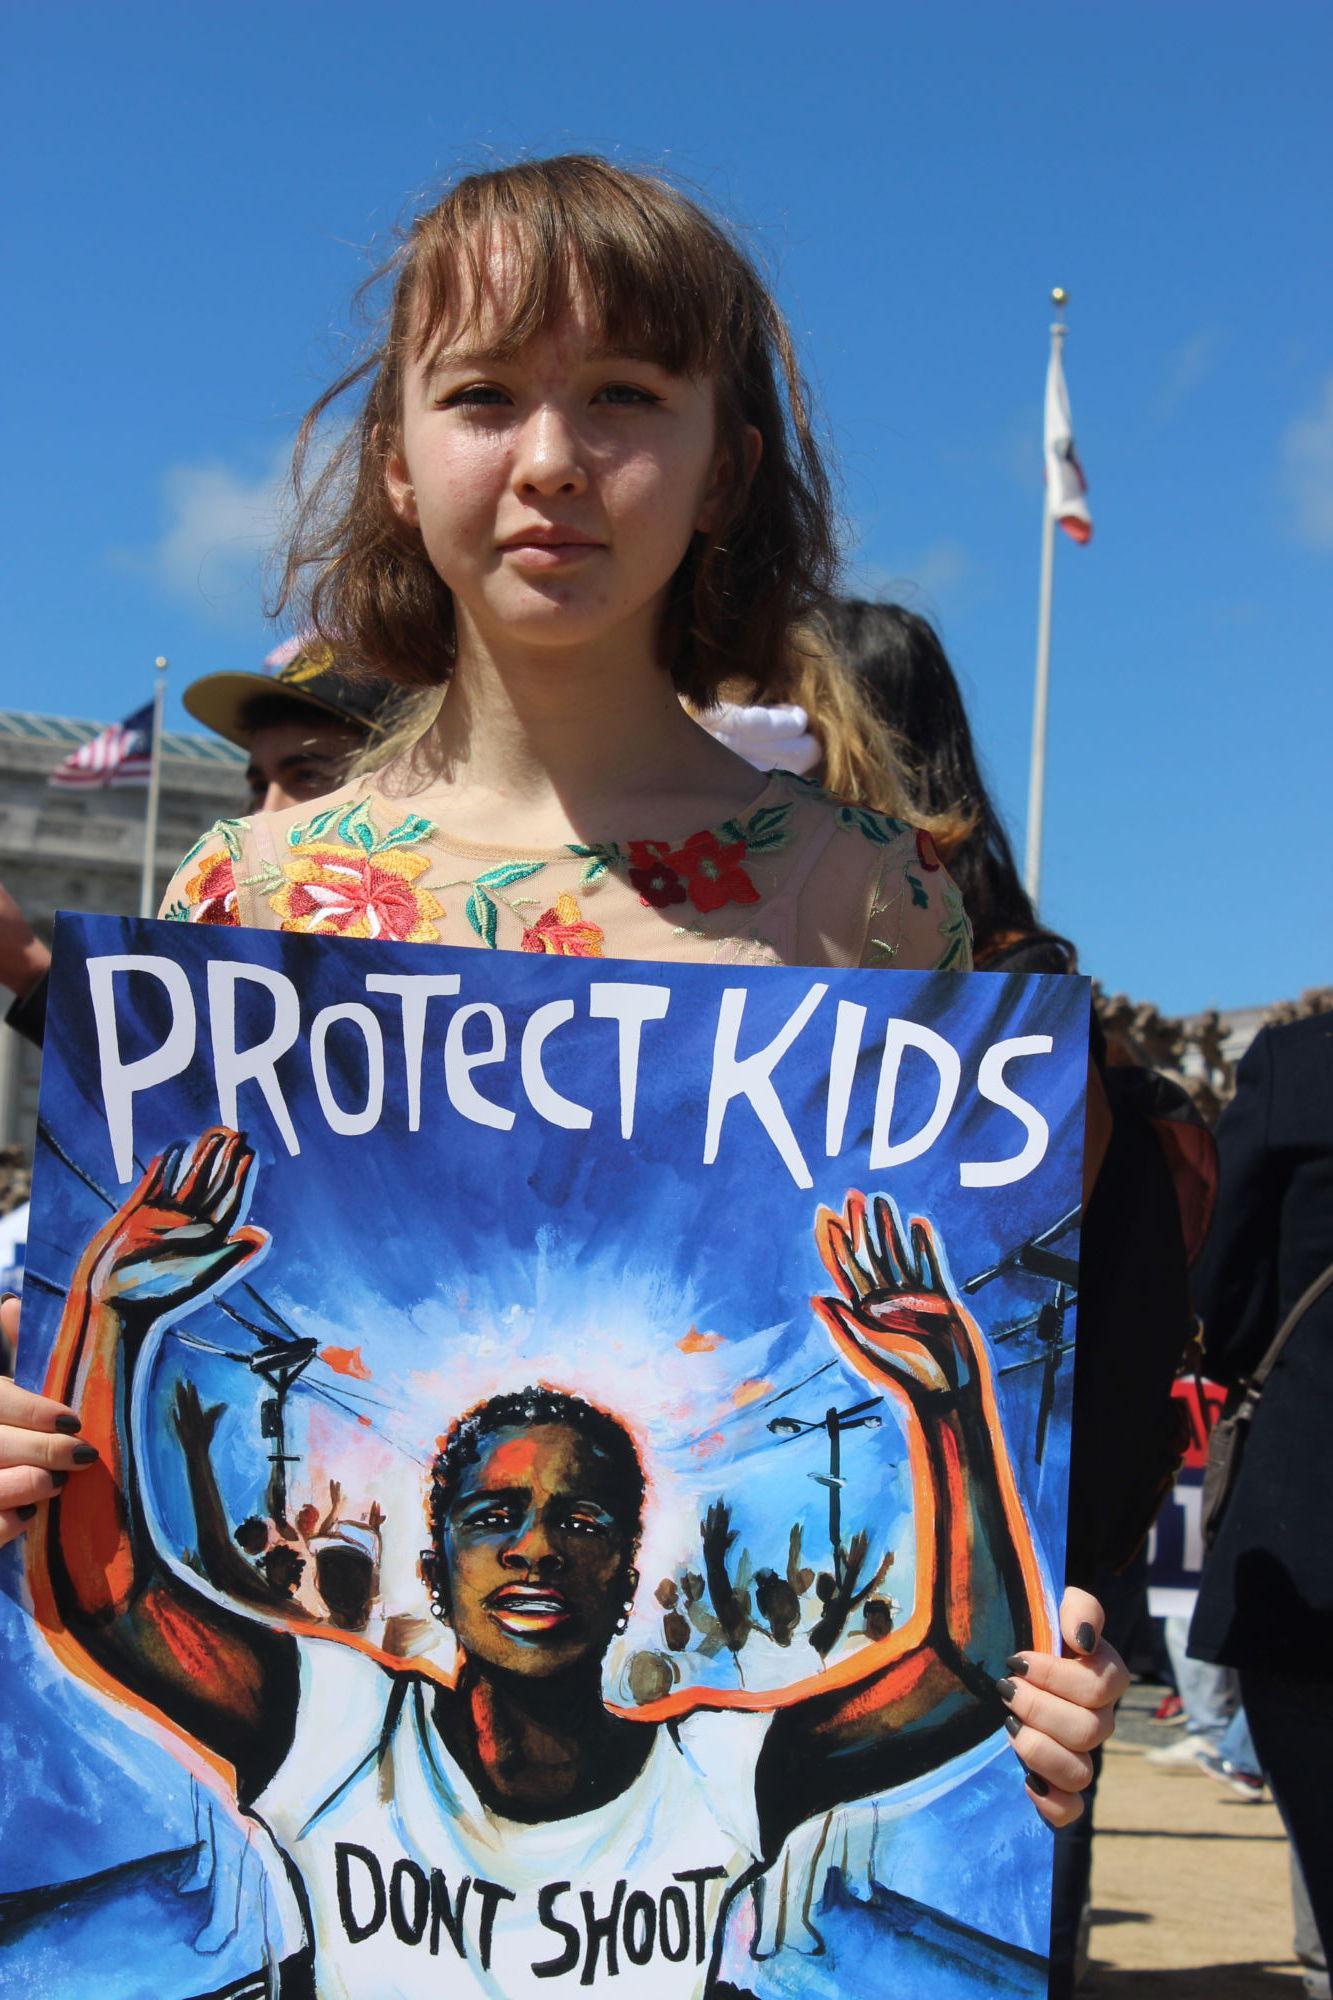 Sophomore+Layla+Isherwood+holding+sign+in+support+of+ending+gun+violence+